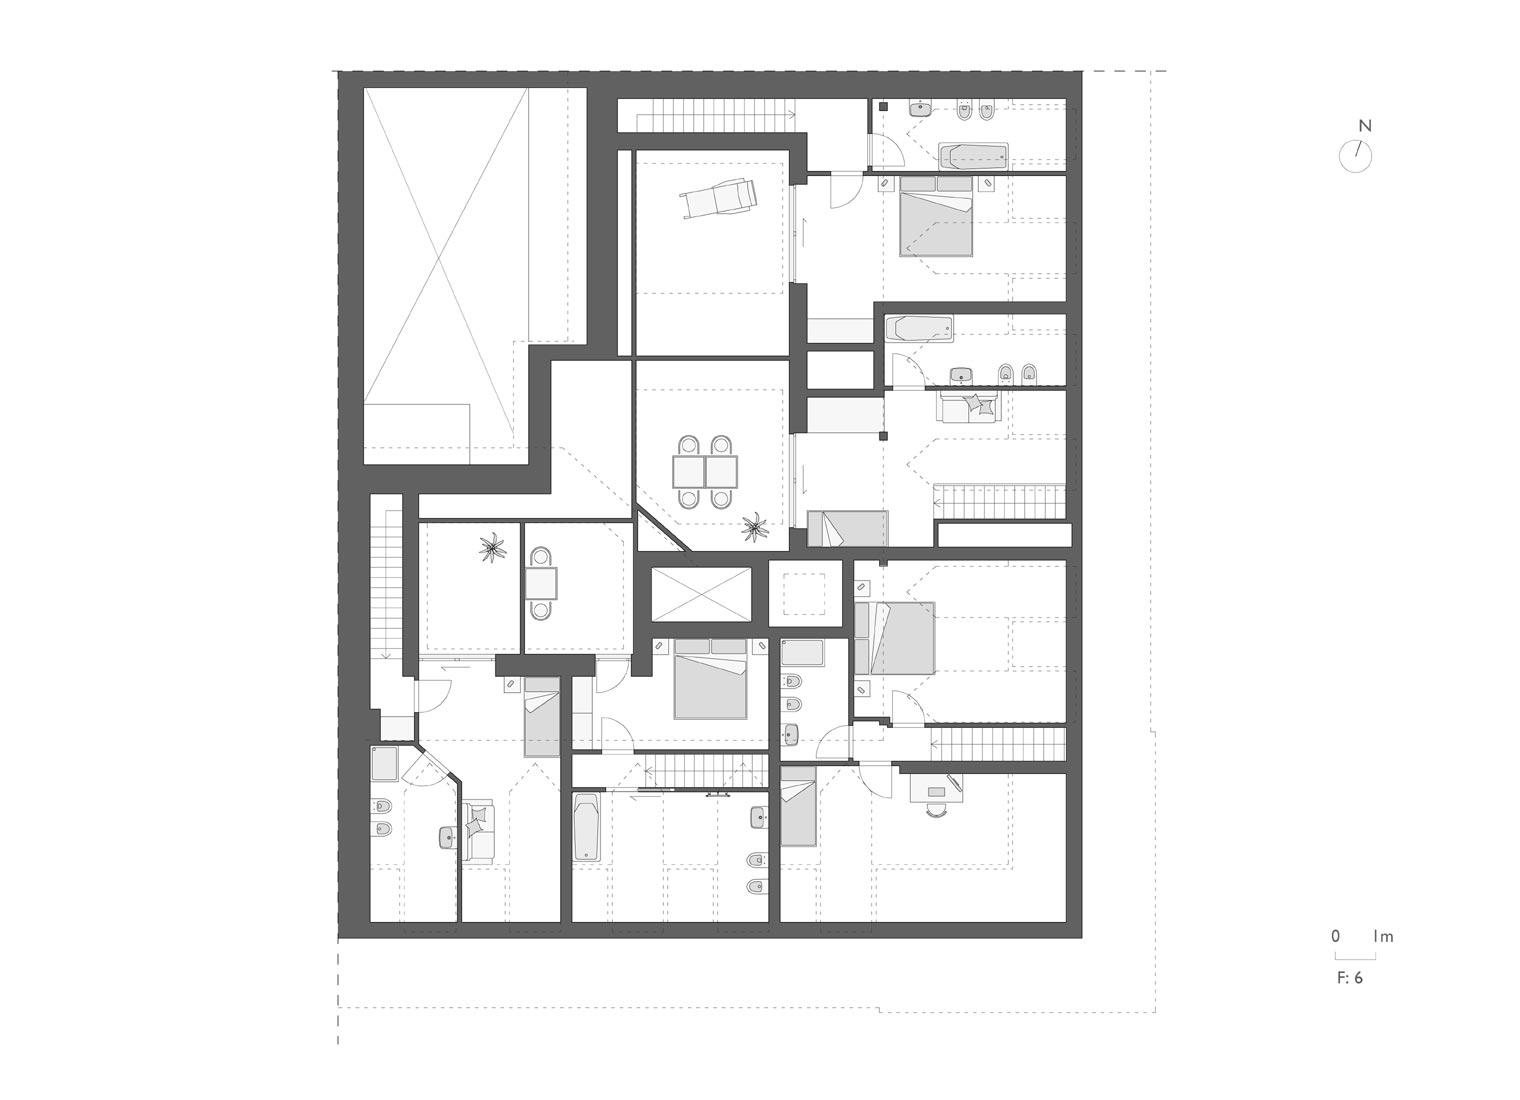 vk-architetti_belvedere_f6